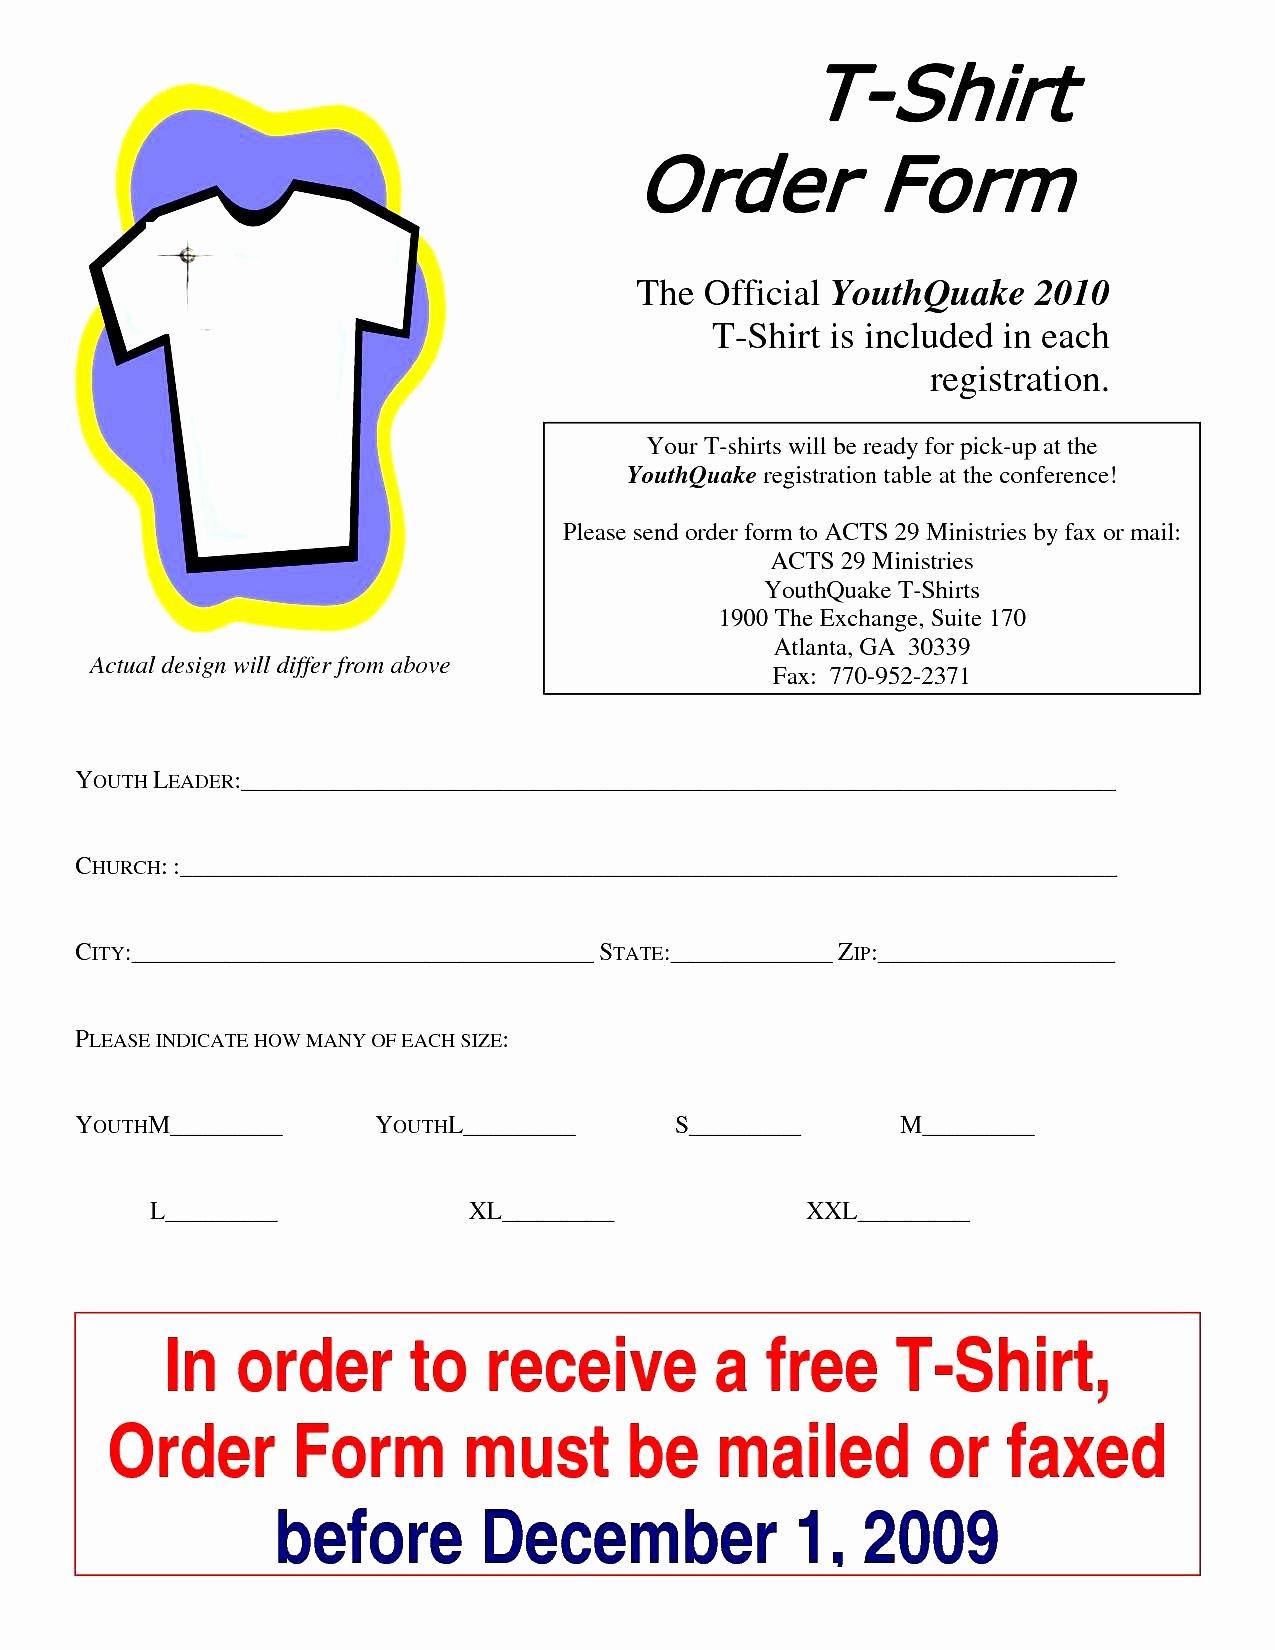 T Shirt order form Template Fresh T Shirt order form Template